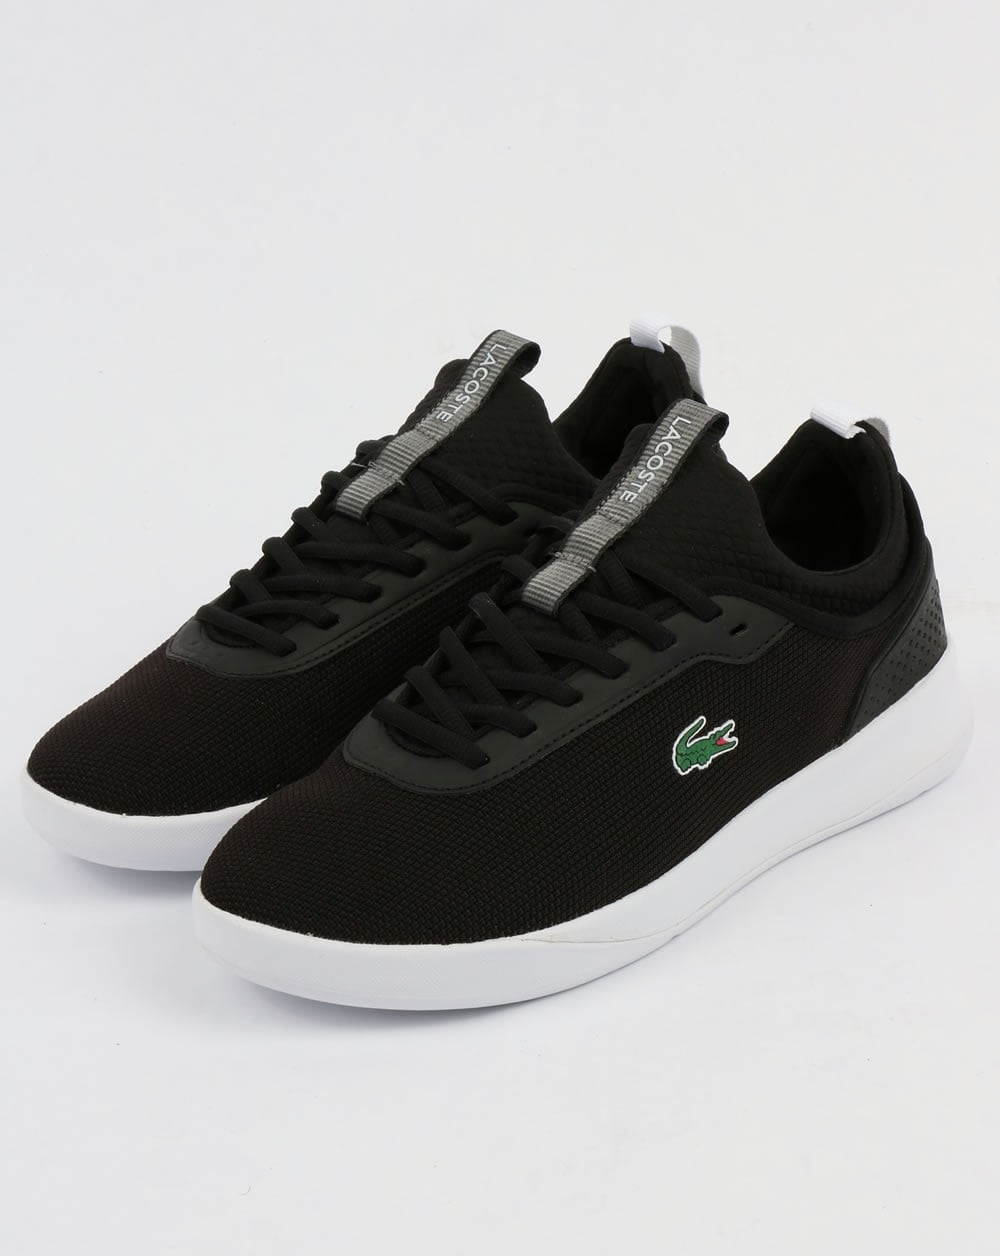 Lt Trainers Blackwhite Footwear 2 Lacoste Spirit 0 vm8yNnwO0